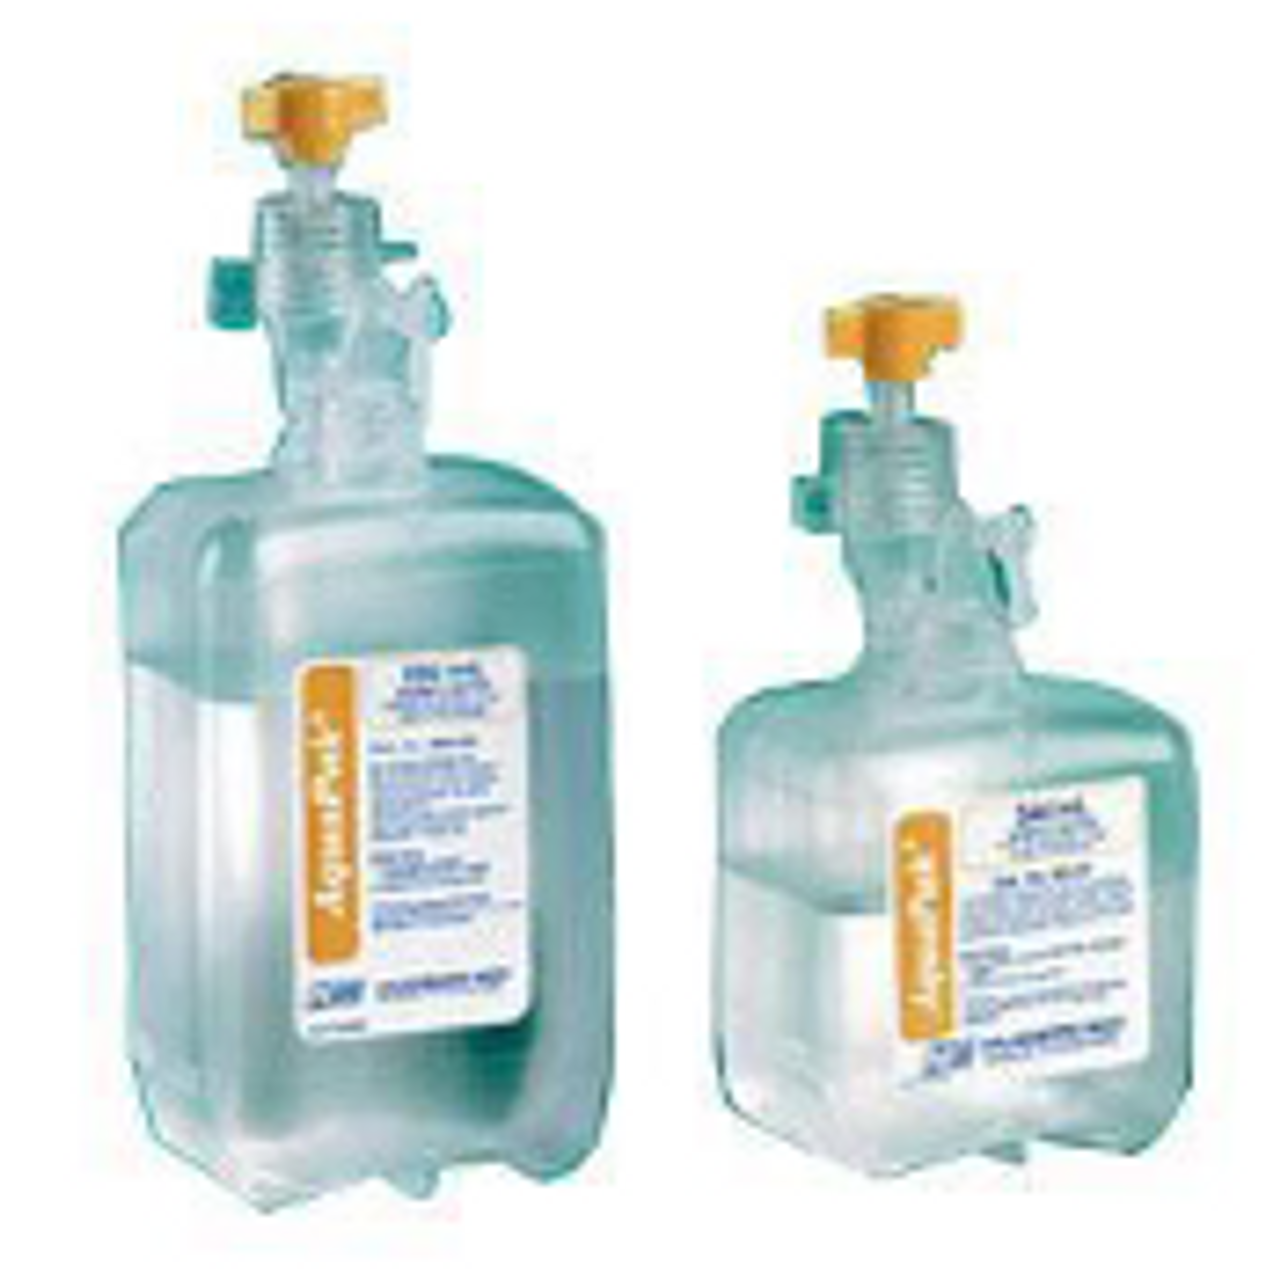 Inhalation Solutions